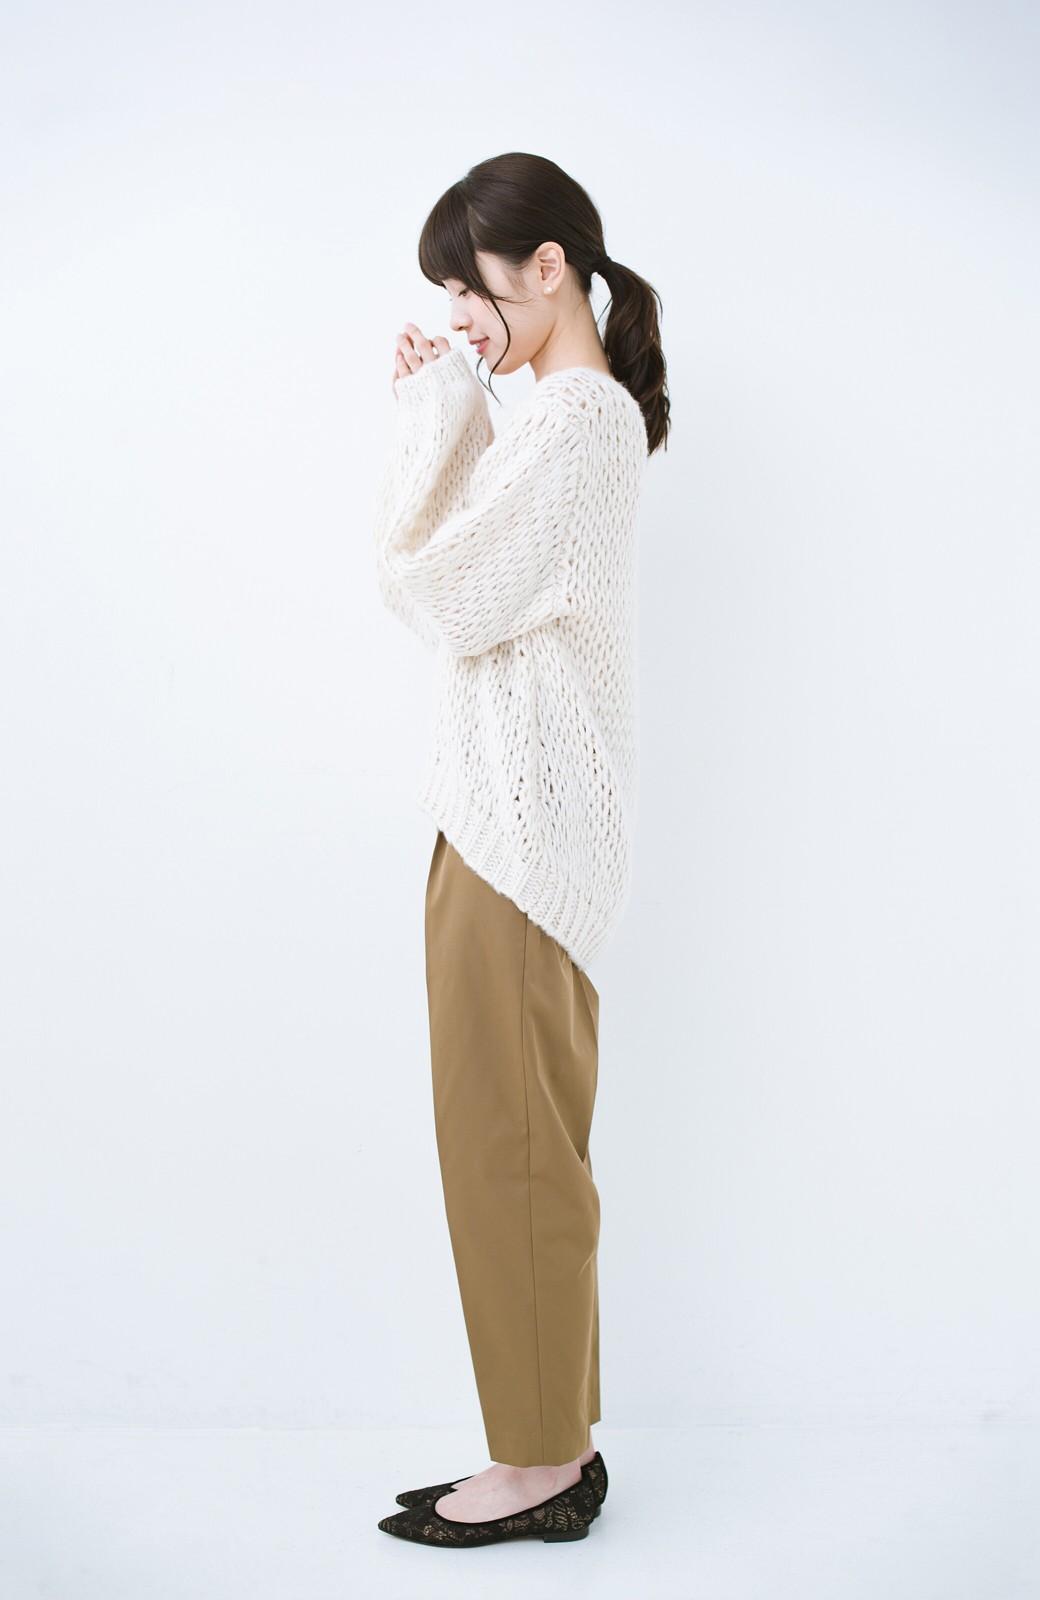 haco! 手編み風のざっくり感で女っぽい Vネックの甘編みルーズニット <アイボリー>の商品写真9